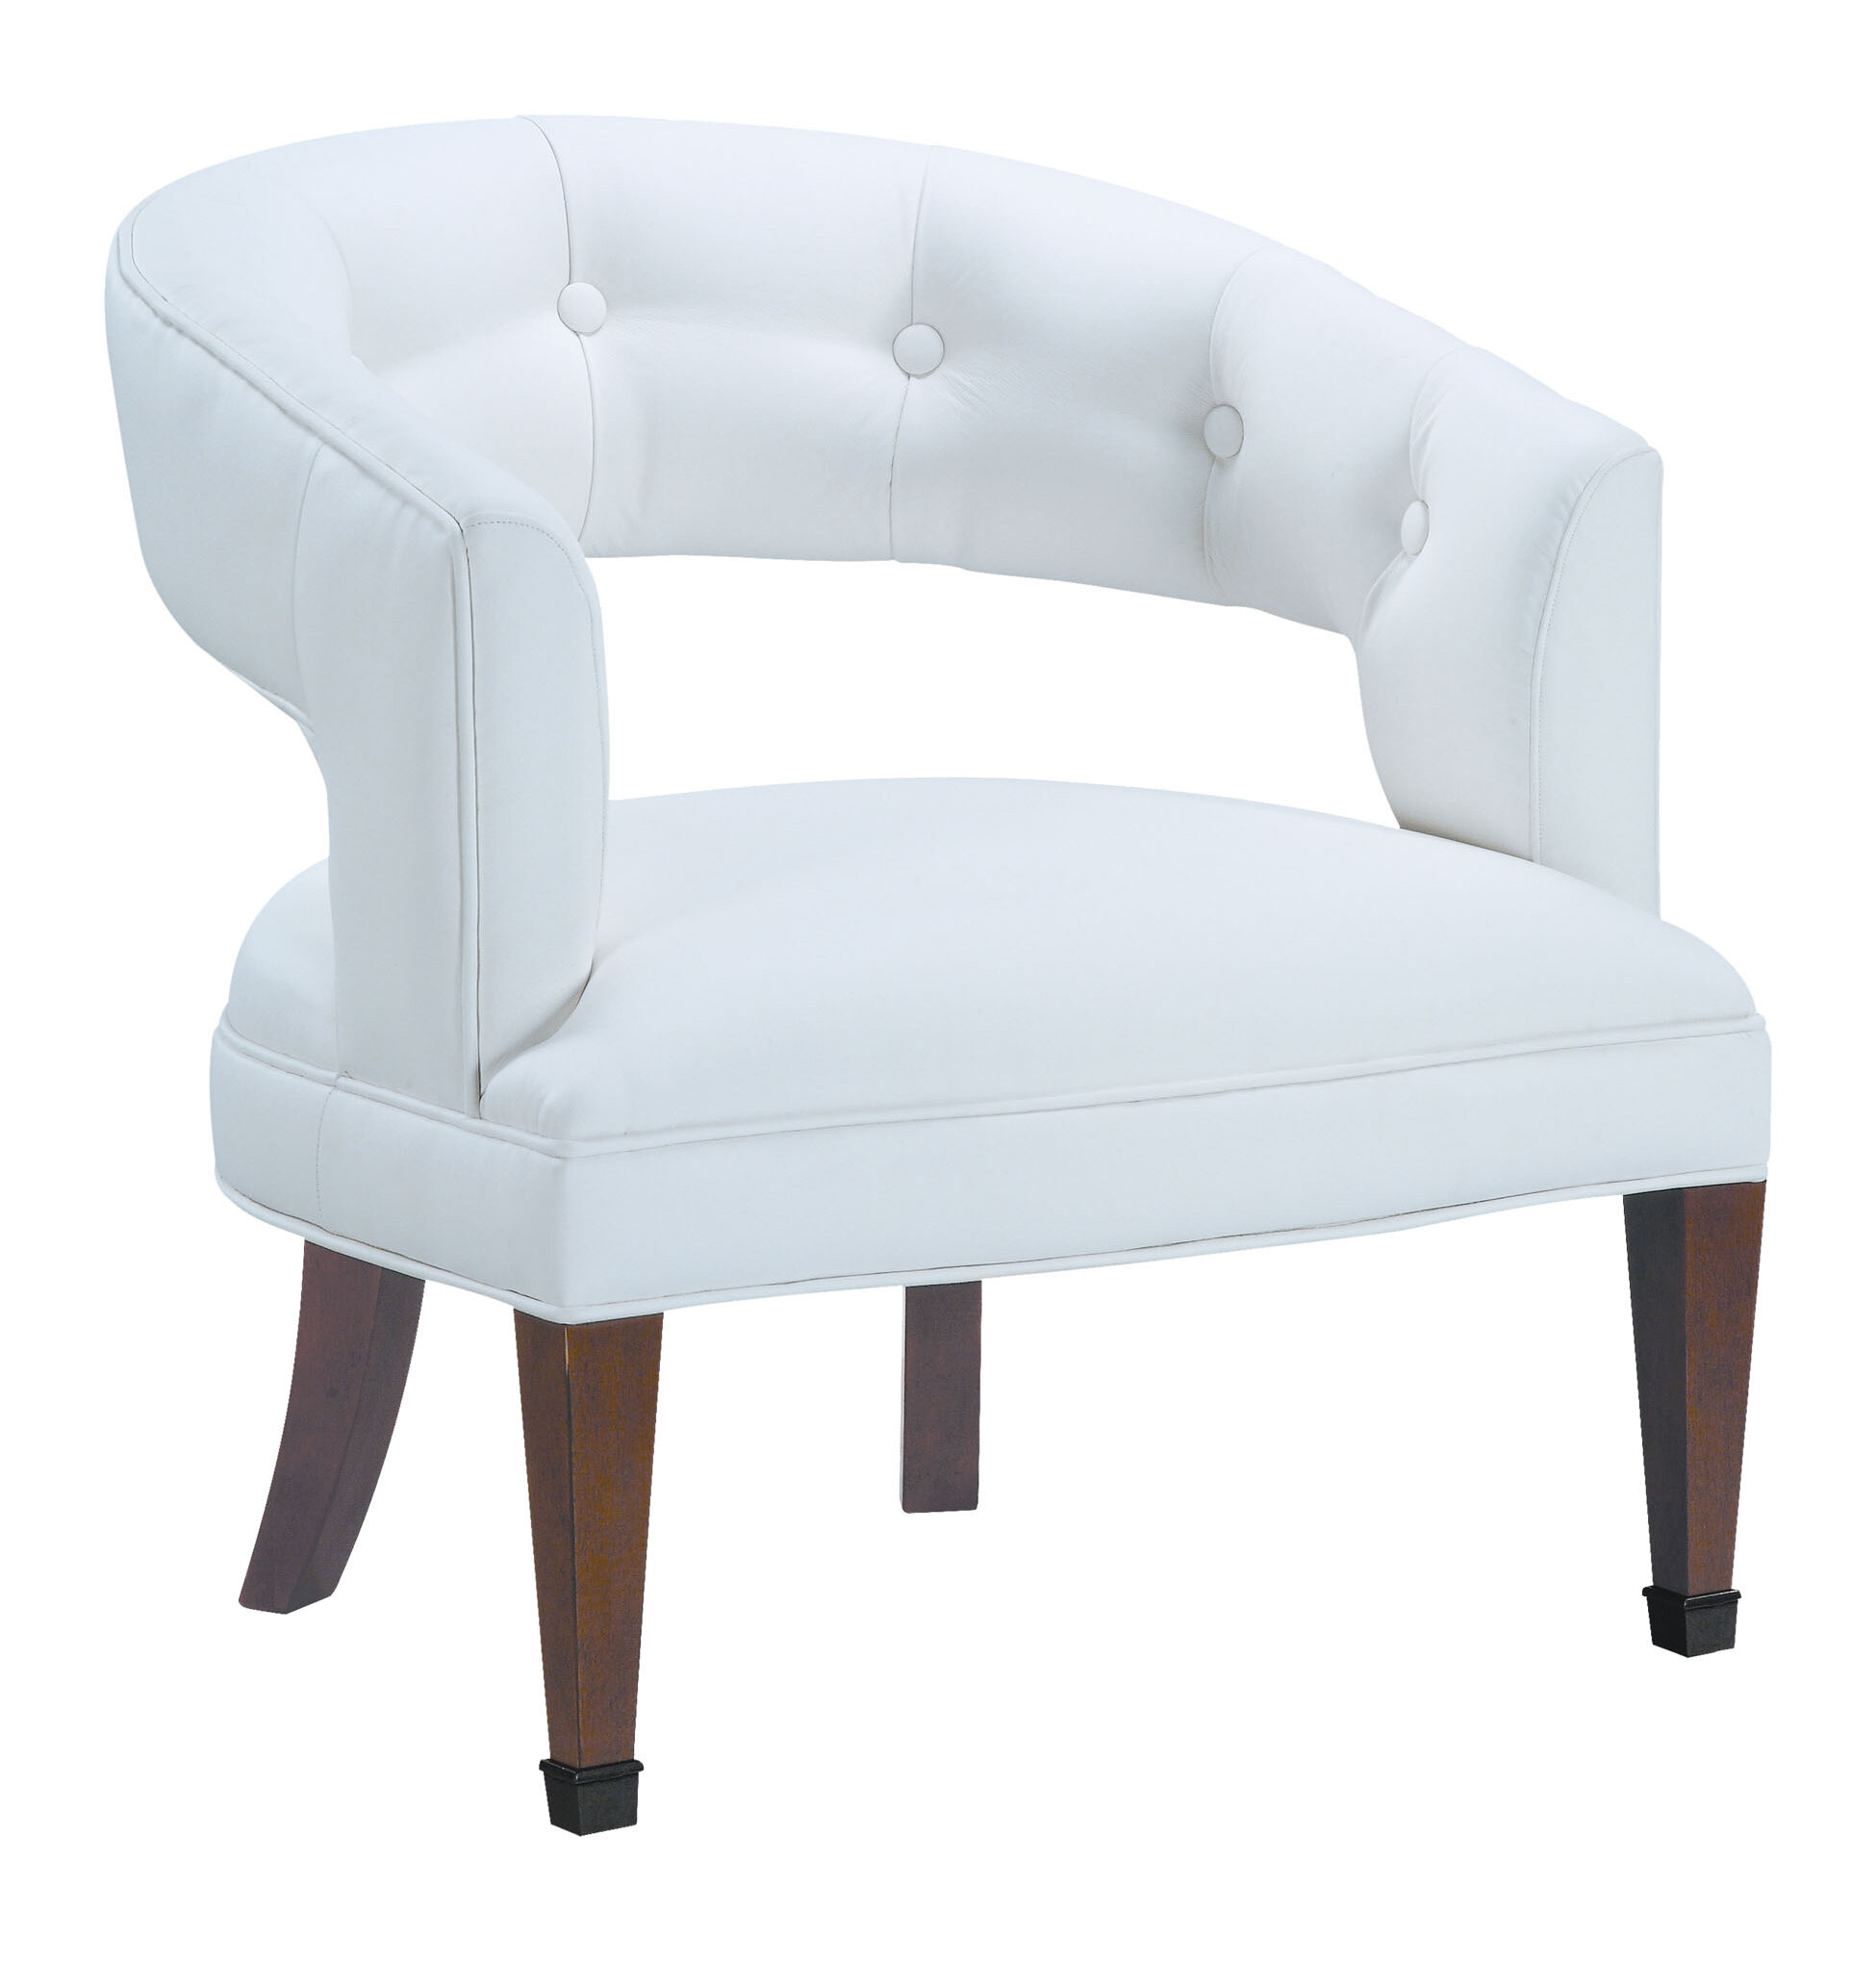 Superieur Darby Home Co Burrough Barrel Chair | Wayfair